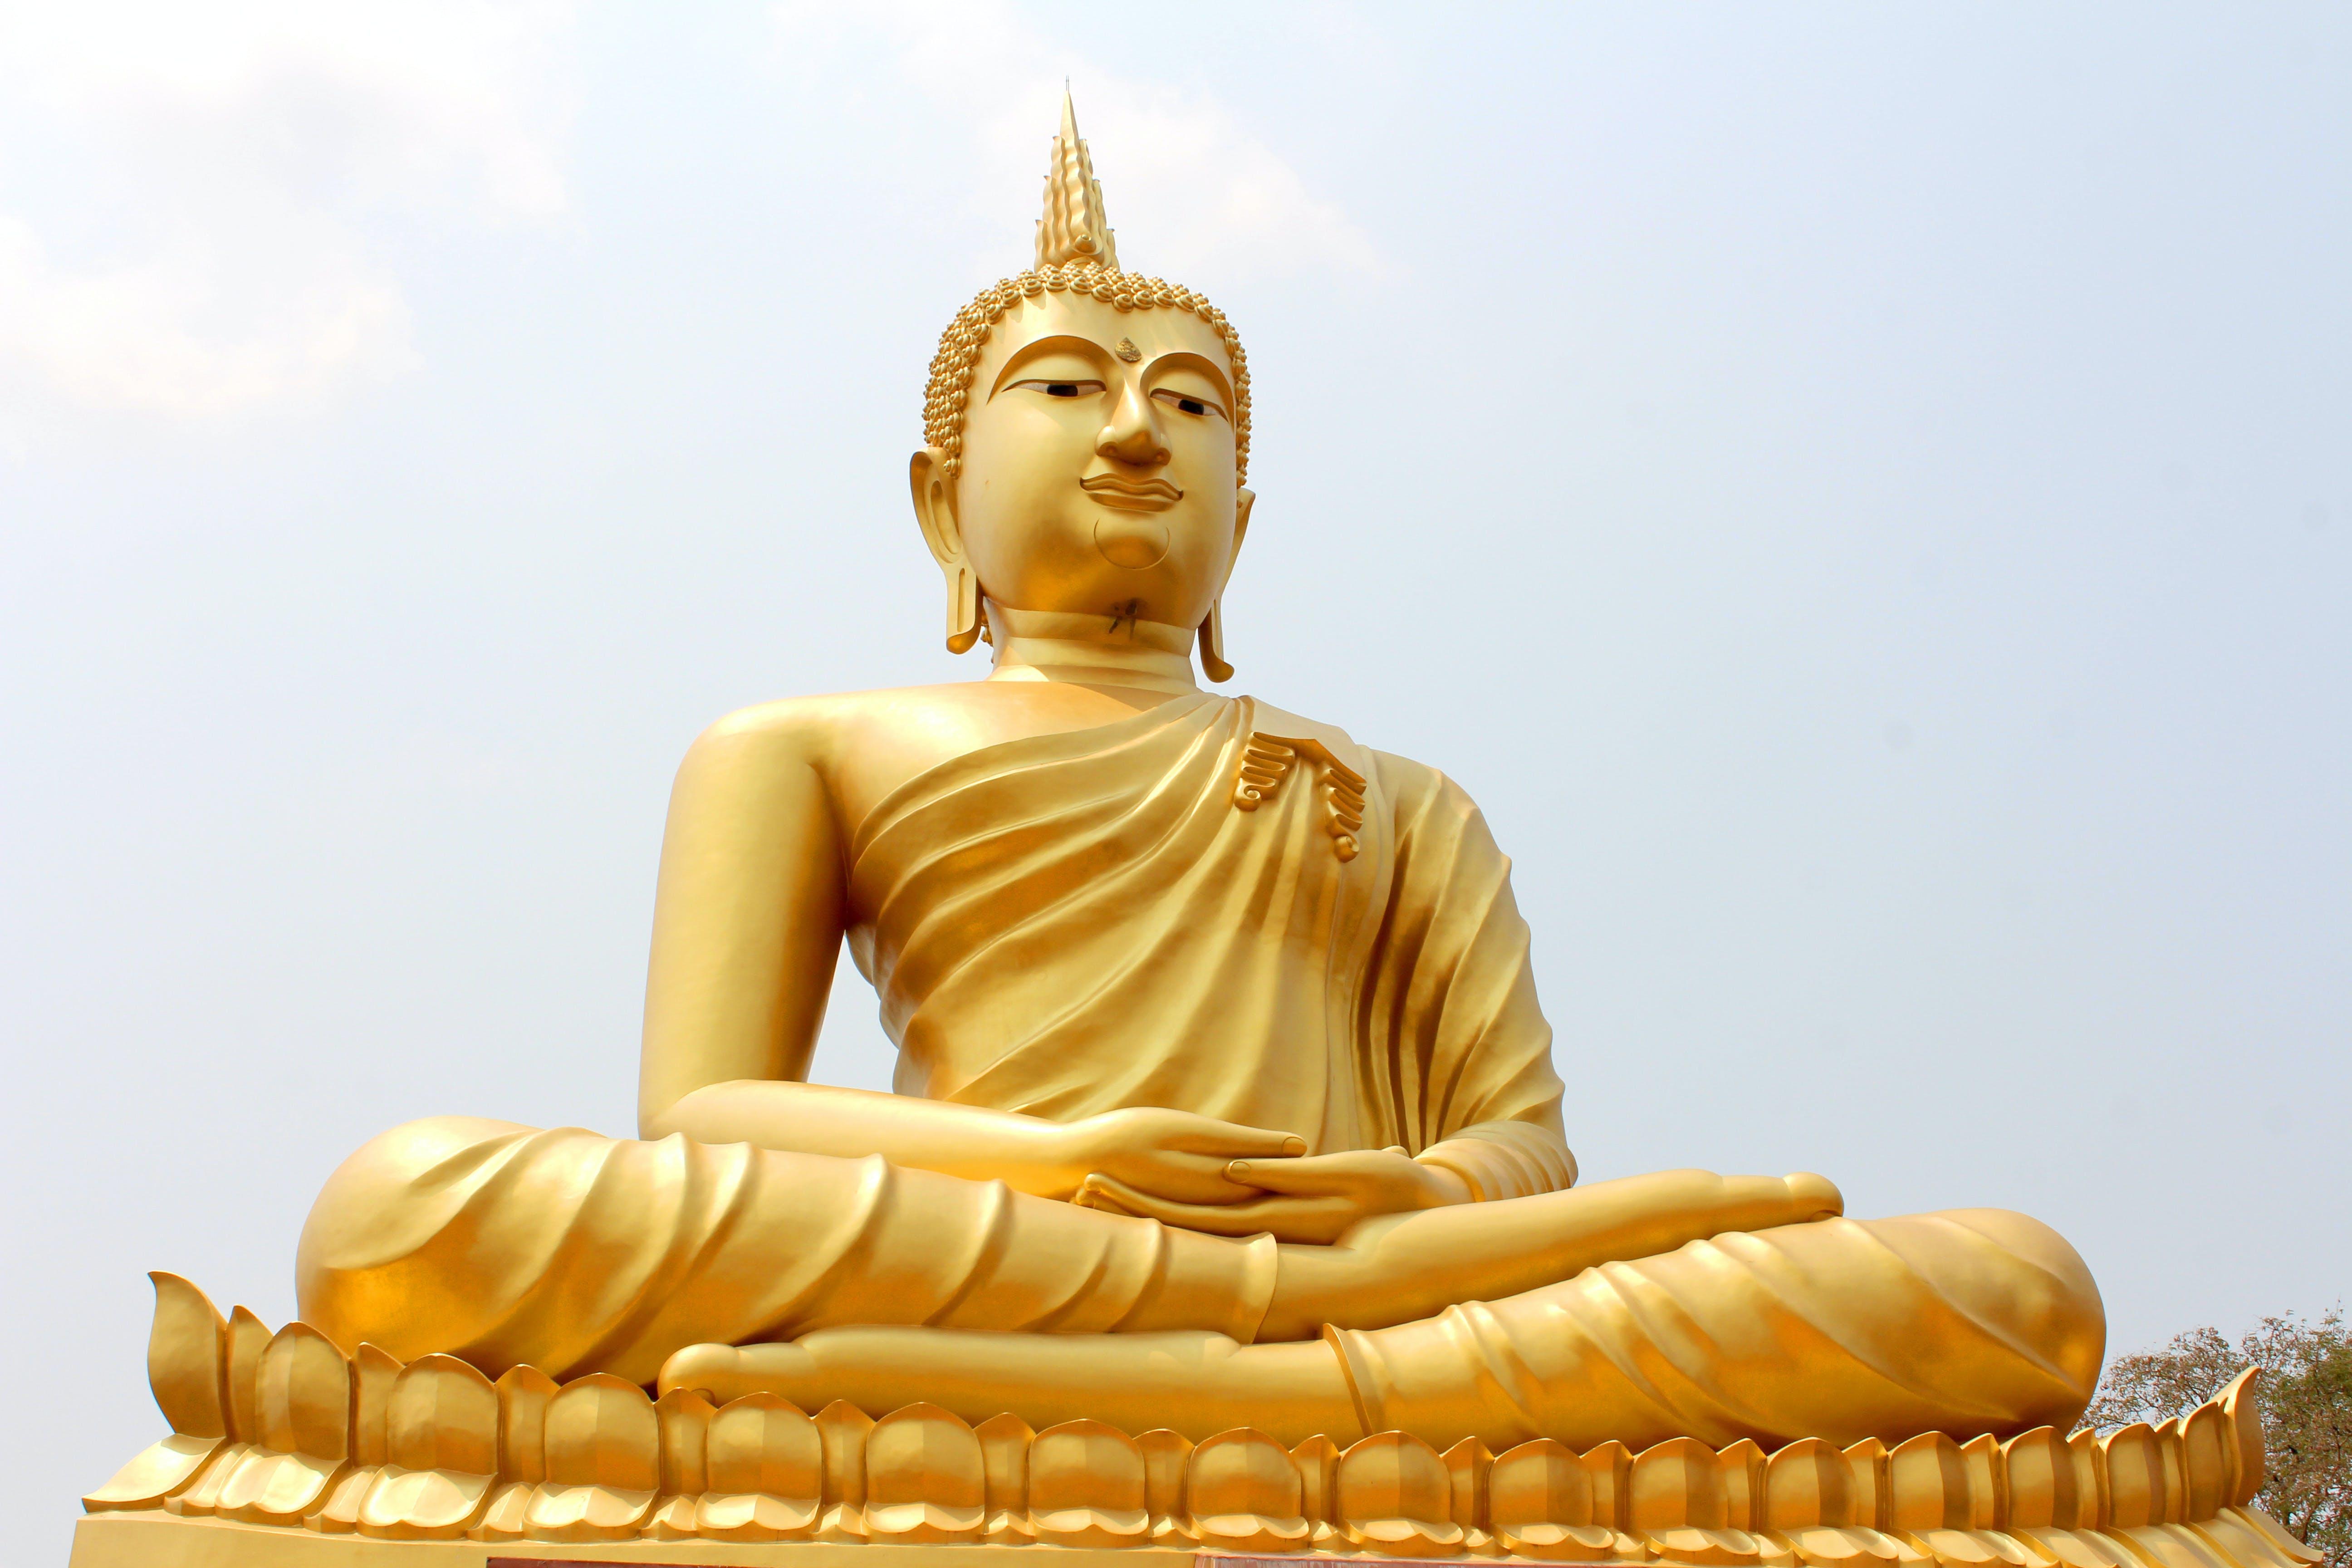 Kostenloses Stock Foto zu anbetung, bäume, bekannt, buddha